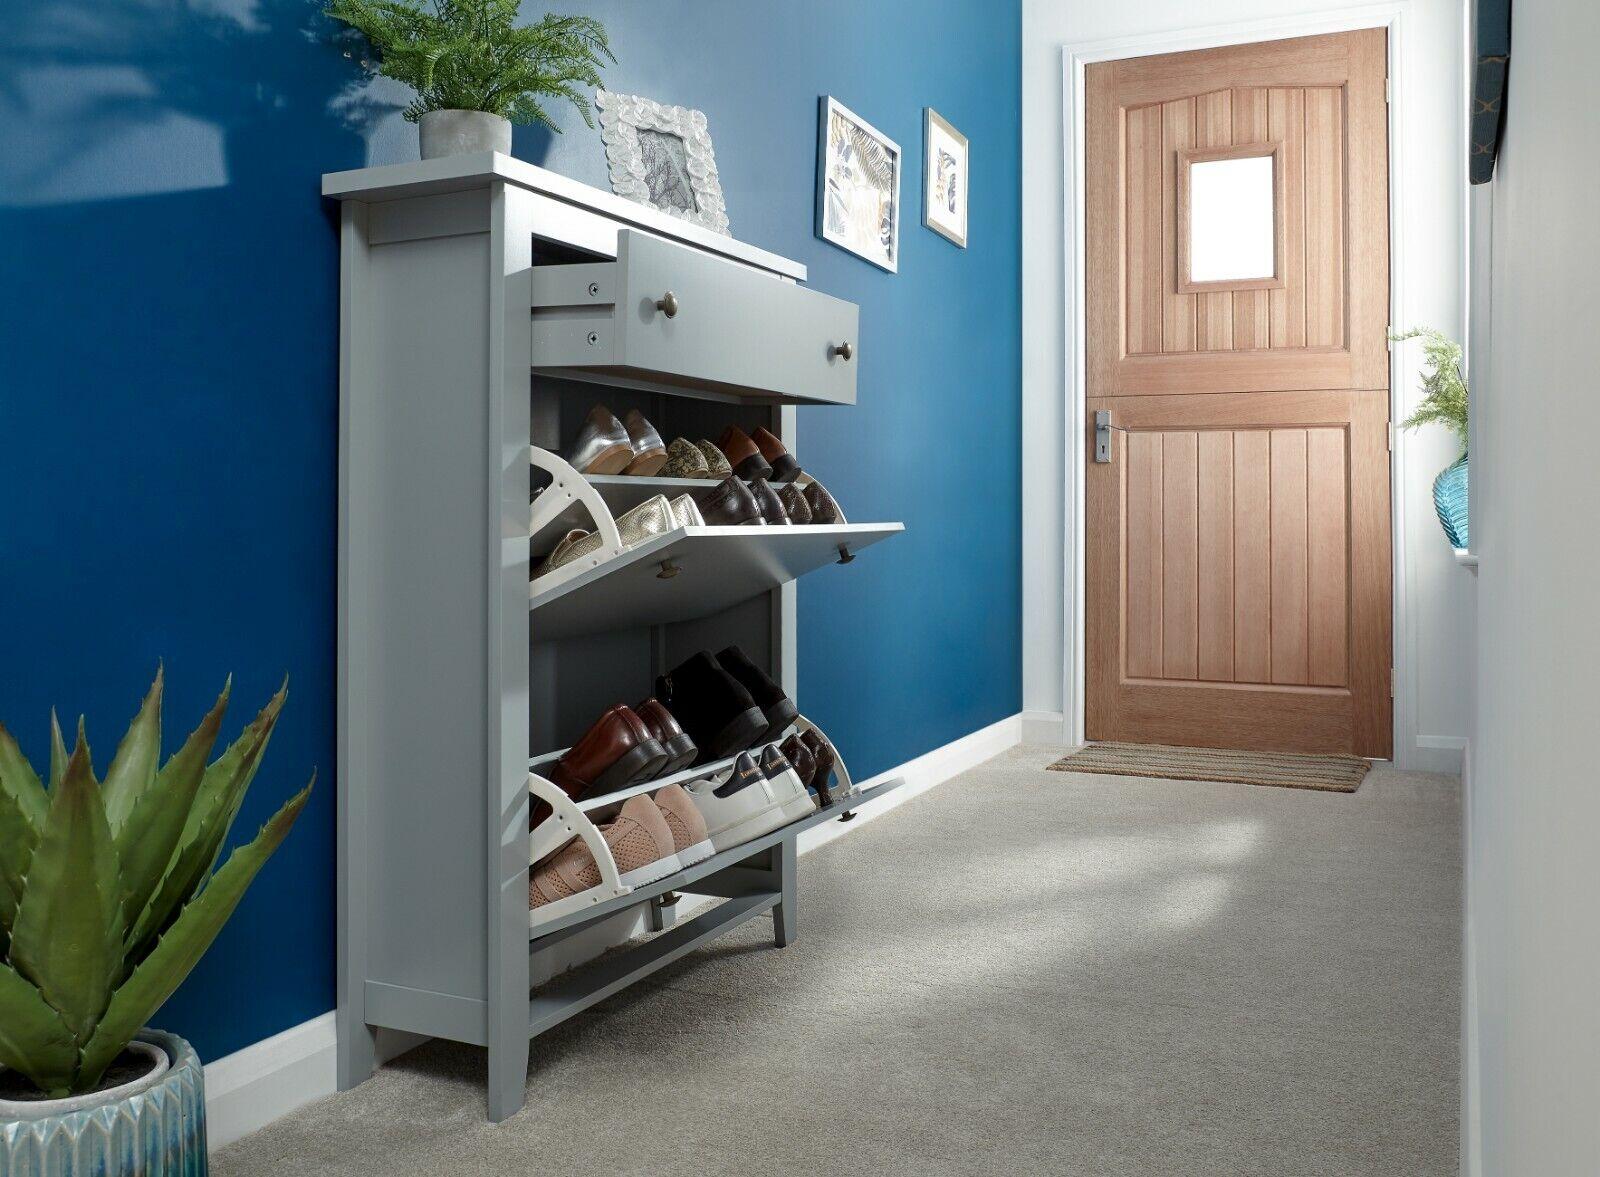 Deluxe Shoe Cabinet 2 Tier Pull Down 2 Door Shoe Storage With Drawer Grey For Sale Online Ebay